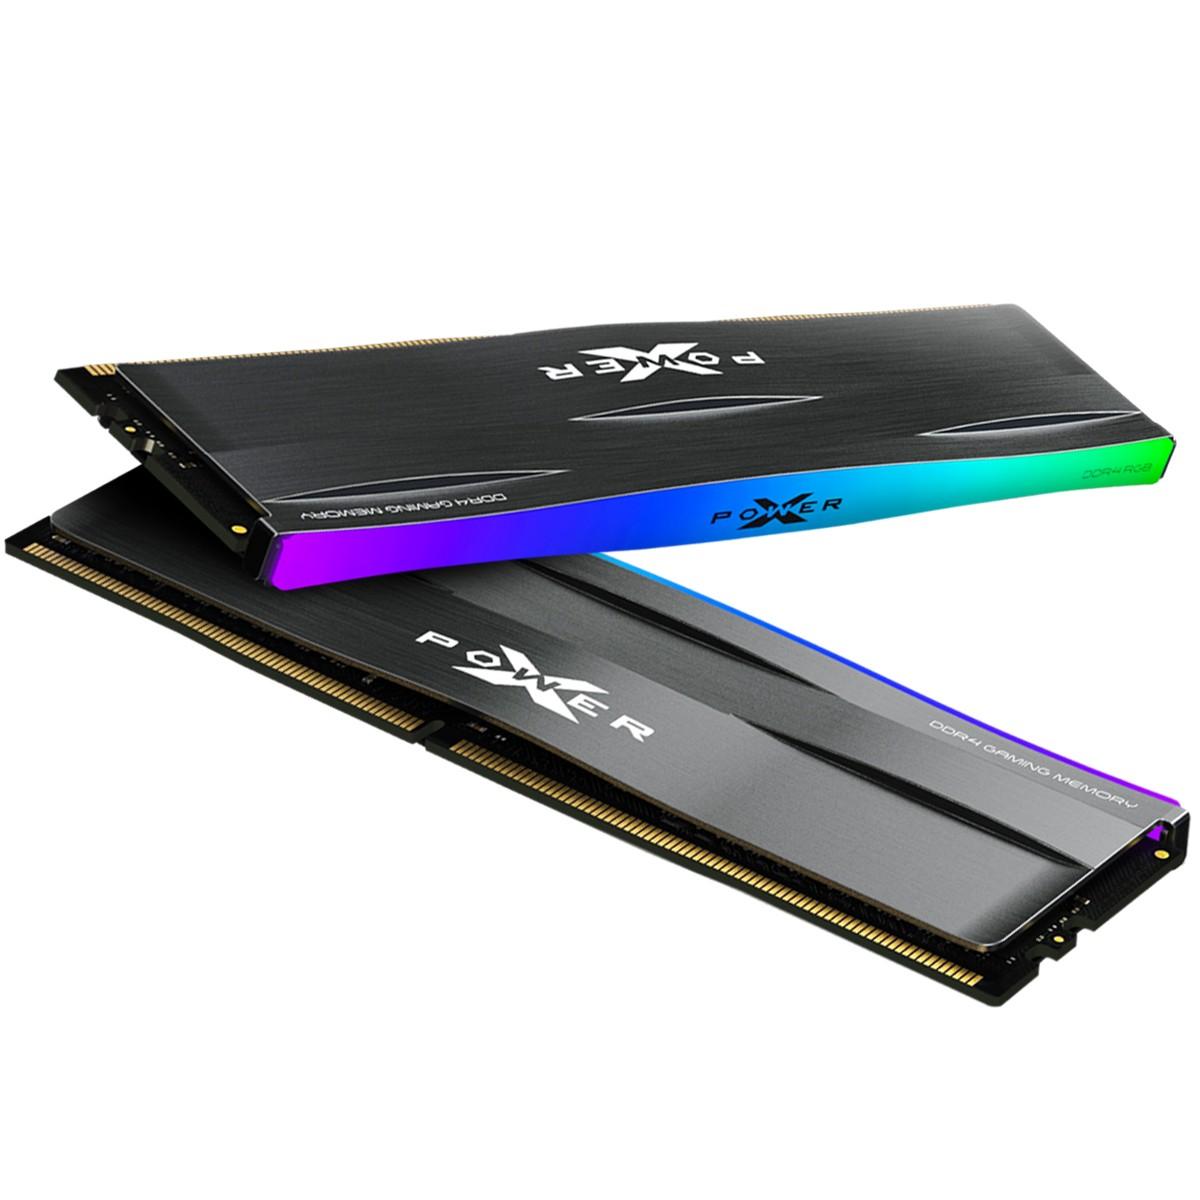 Silicon Power 32GB (2x16GB) SP032GXLZU360BDD 3600MHz XPOWER RGB Zenith Gaming Desktop Memory DDR4 RAM